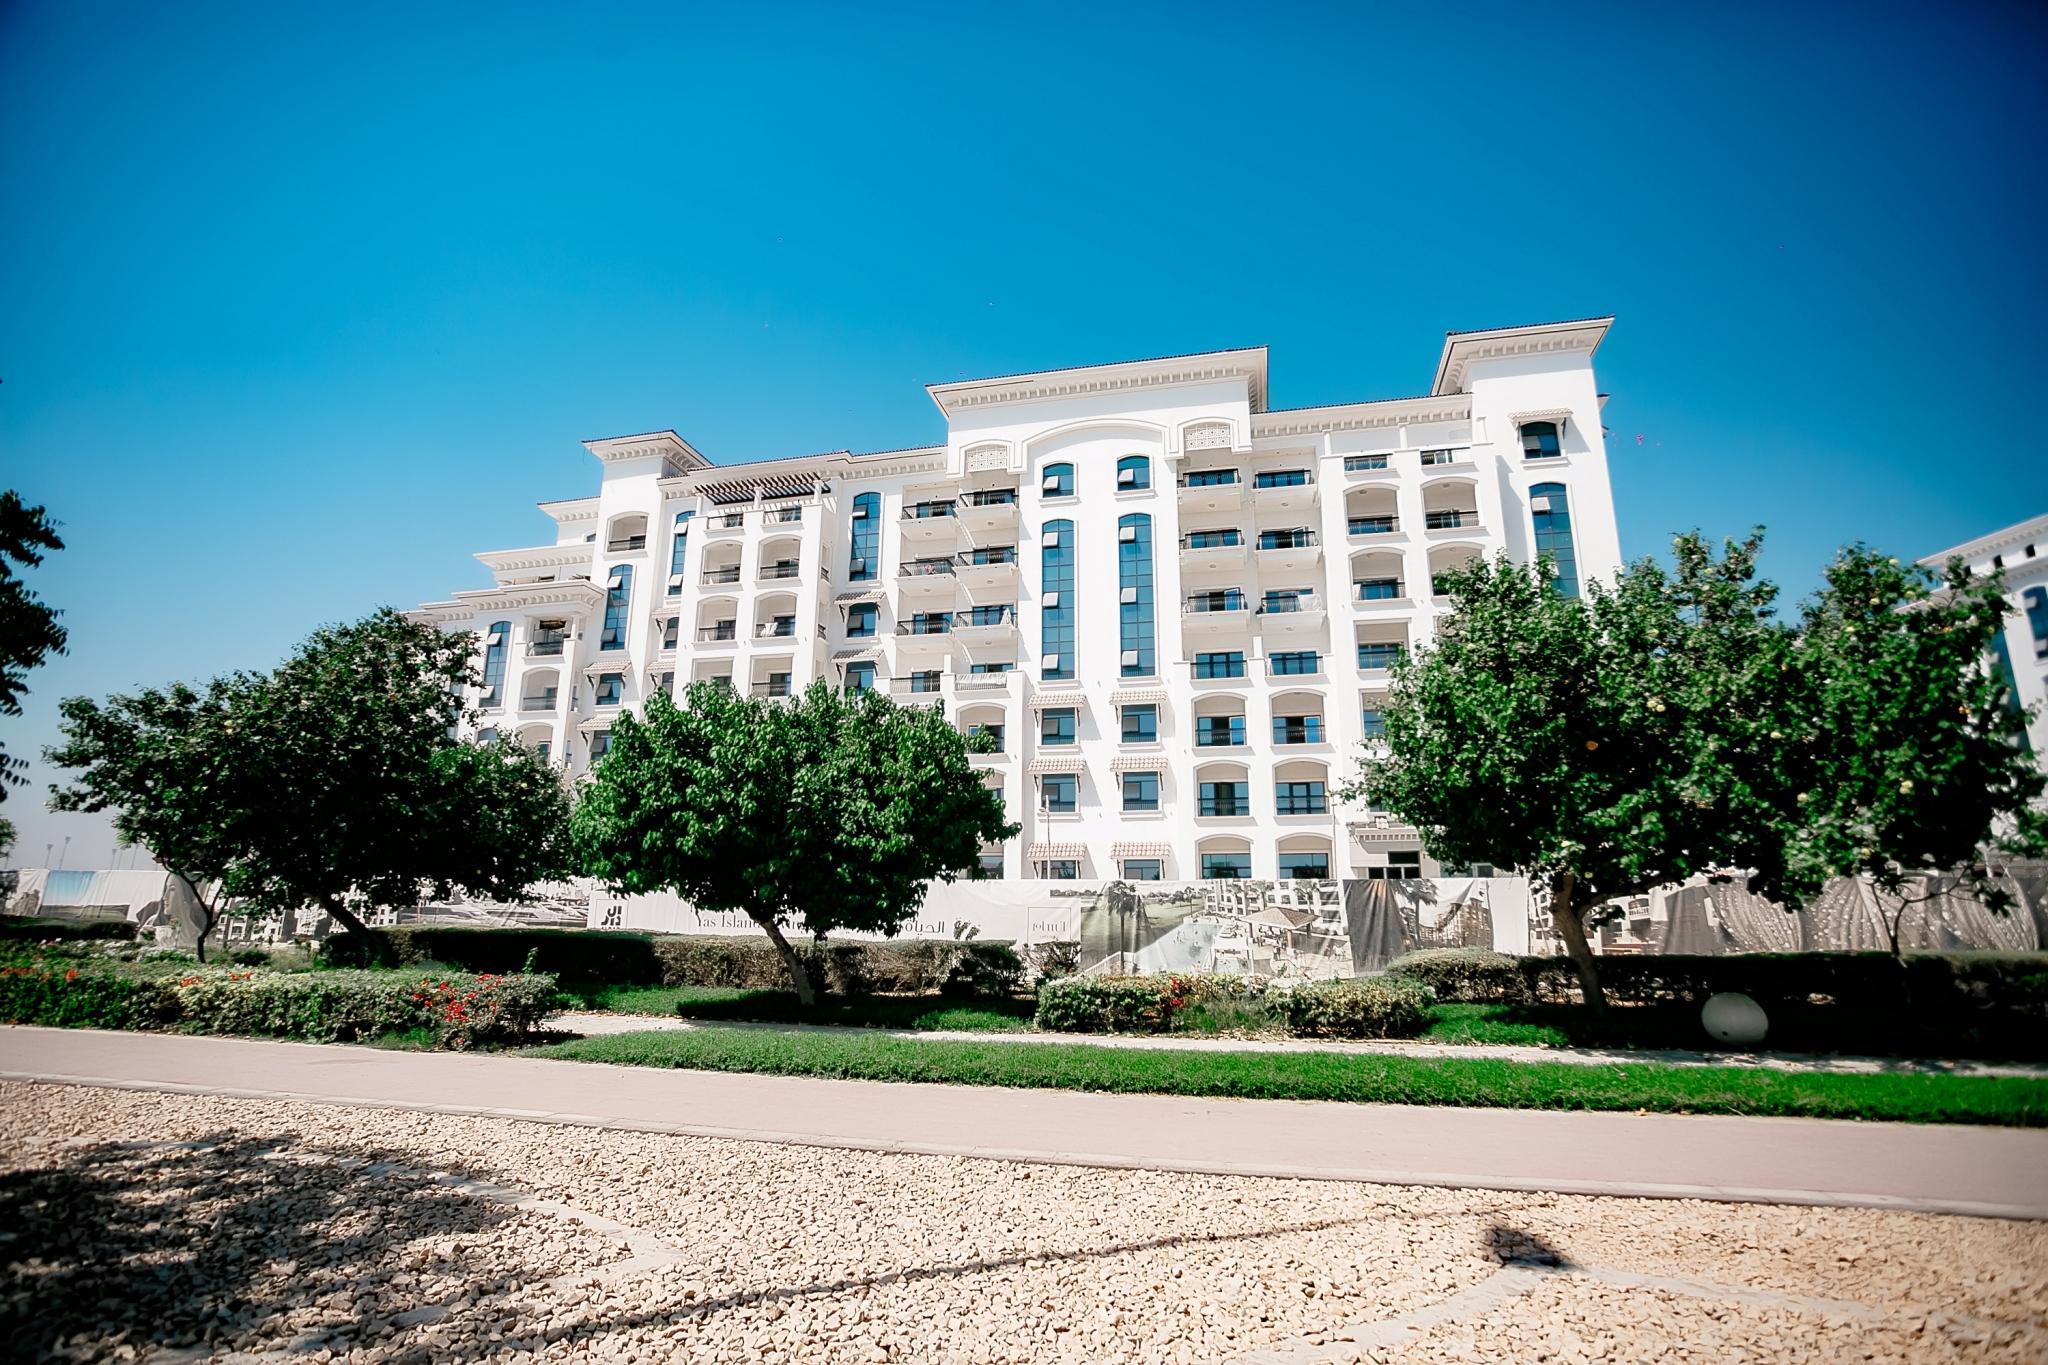 Ansam - Aldar Properties